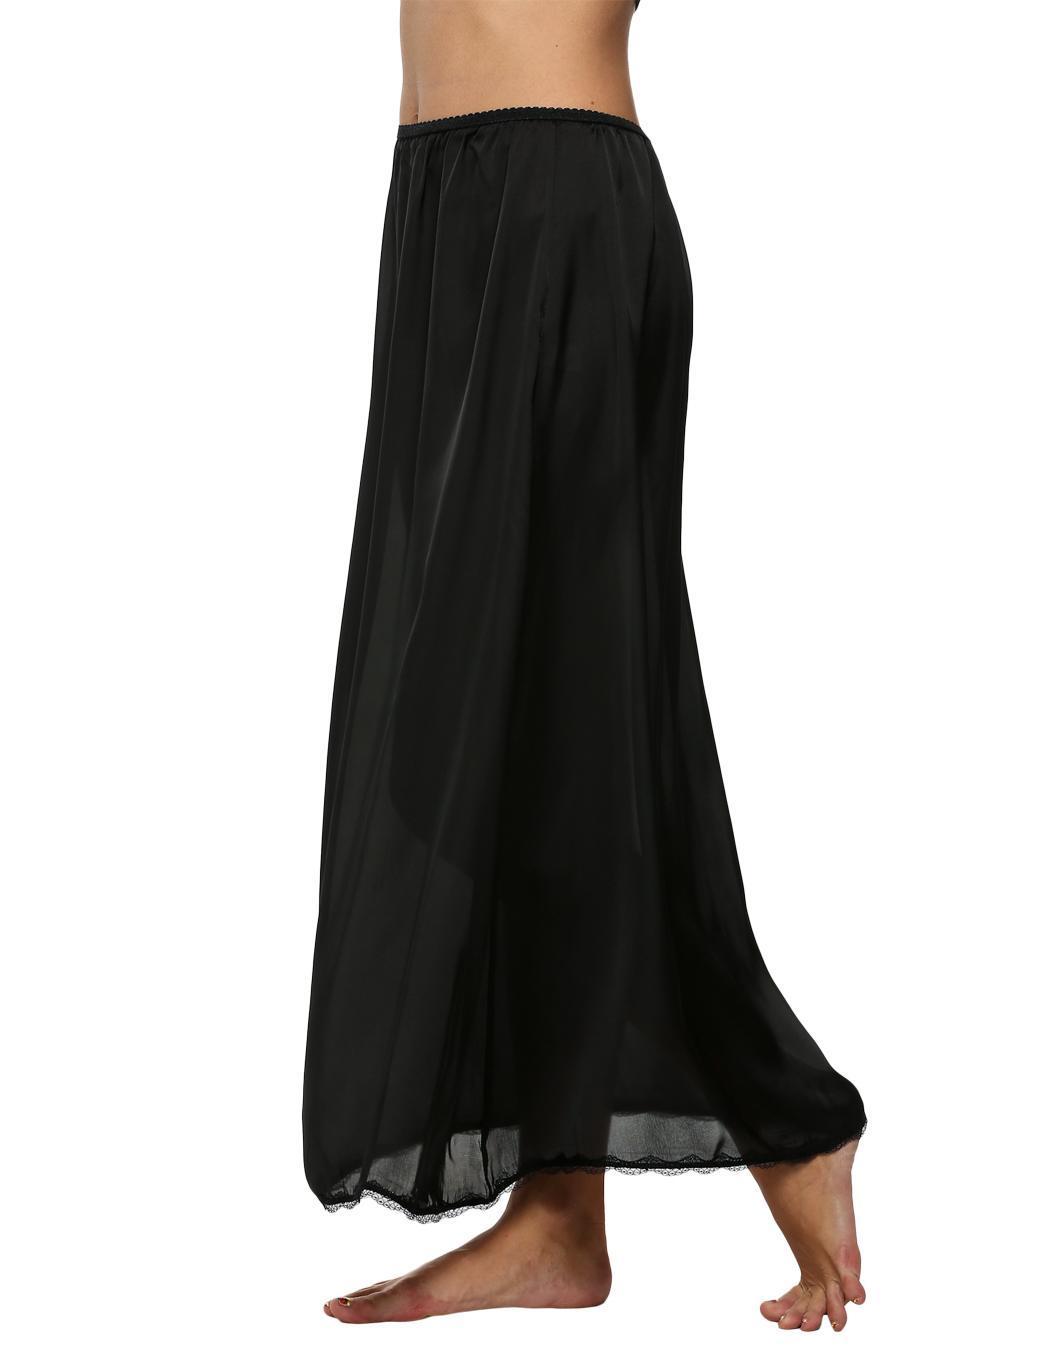 Women Satin Solid Lace Trim Maxi Half Slip Underskirt Slip Skirt 0